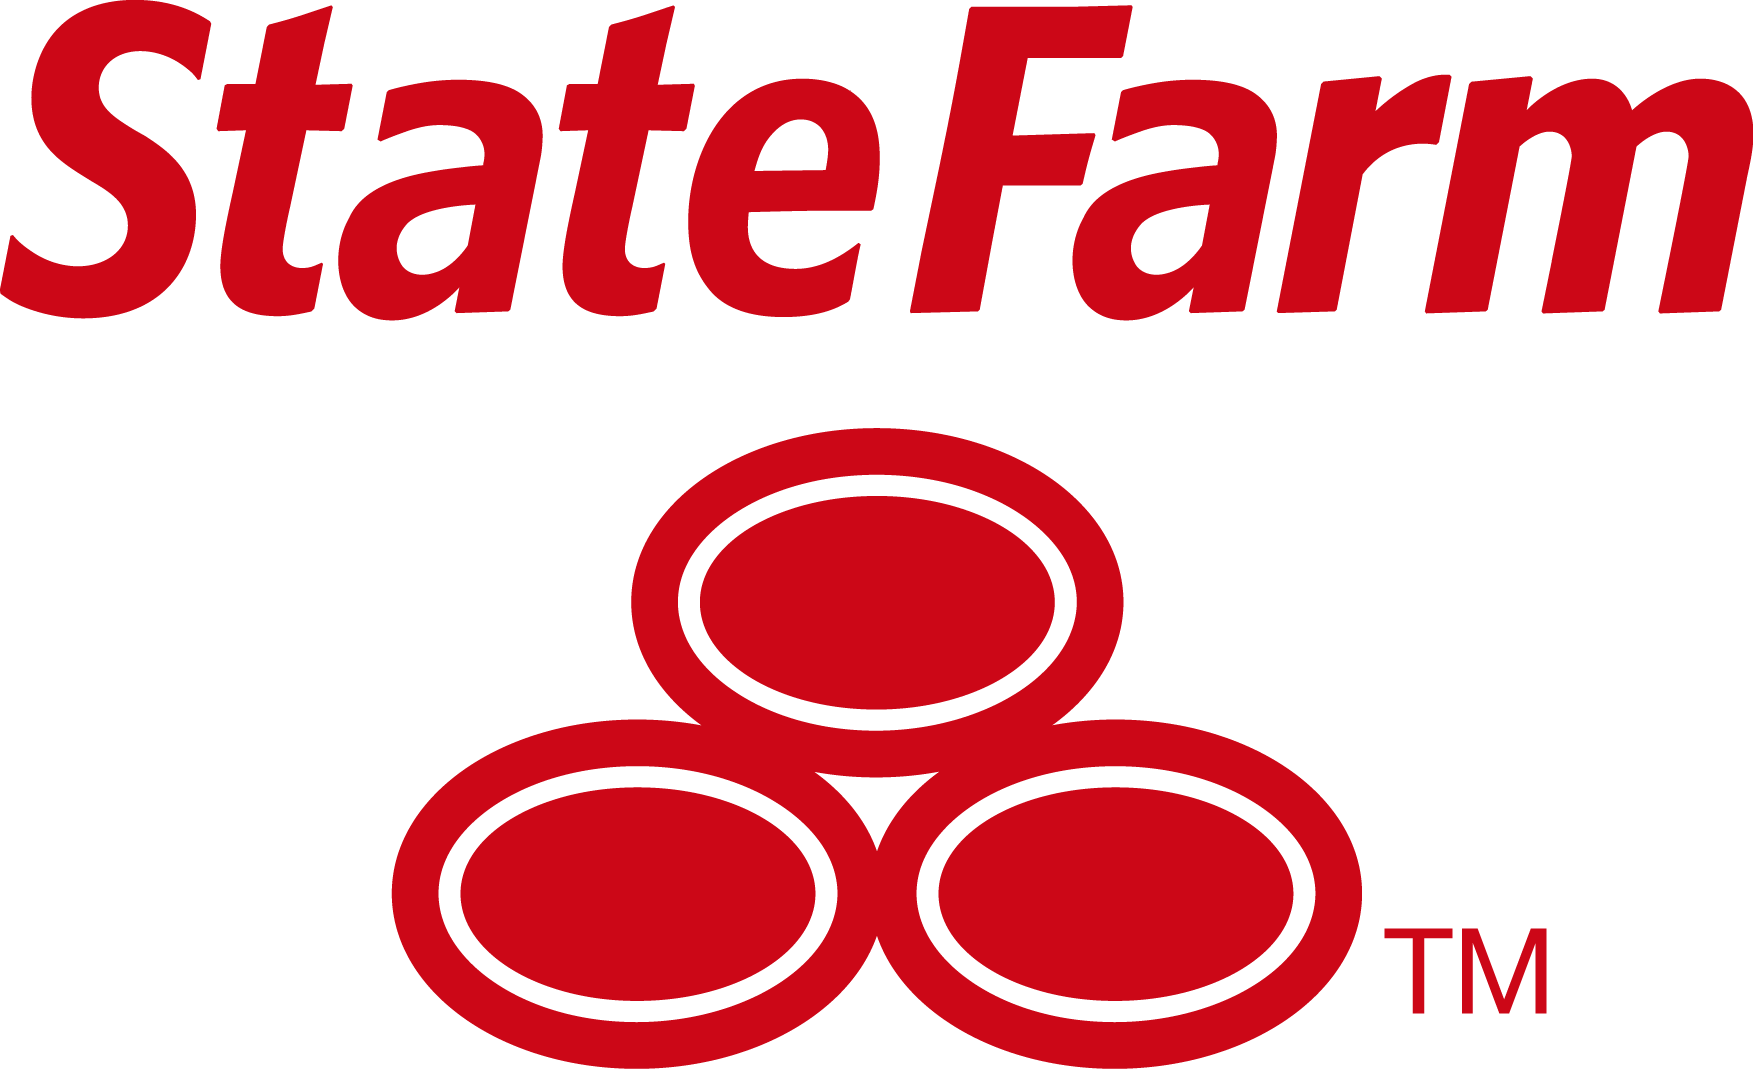 State logos . Farm clipart symbol